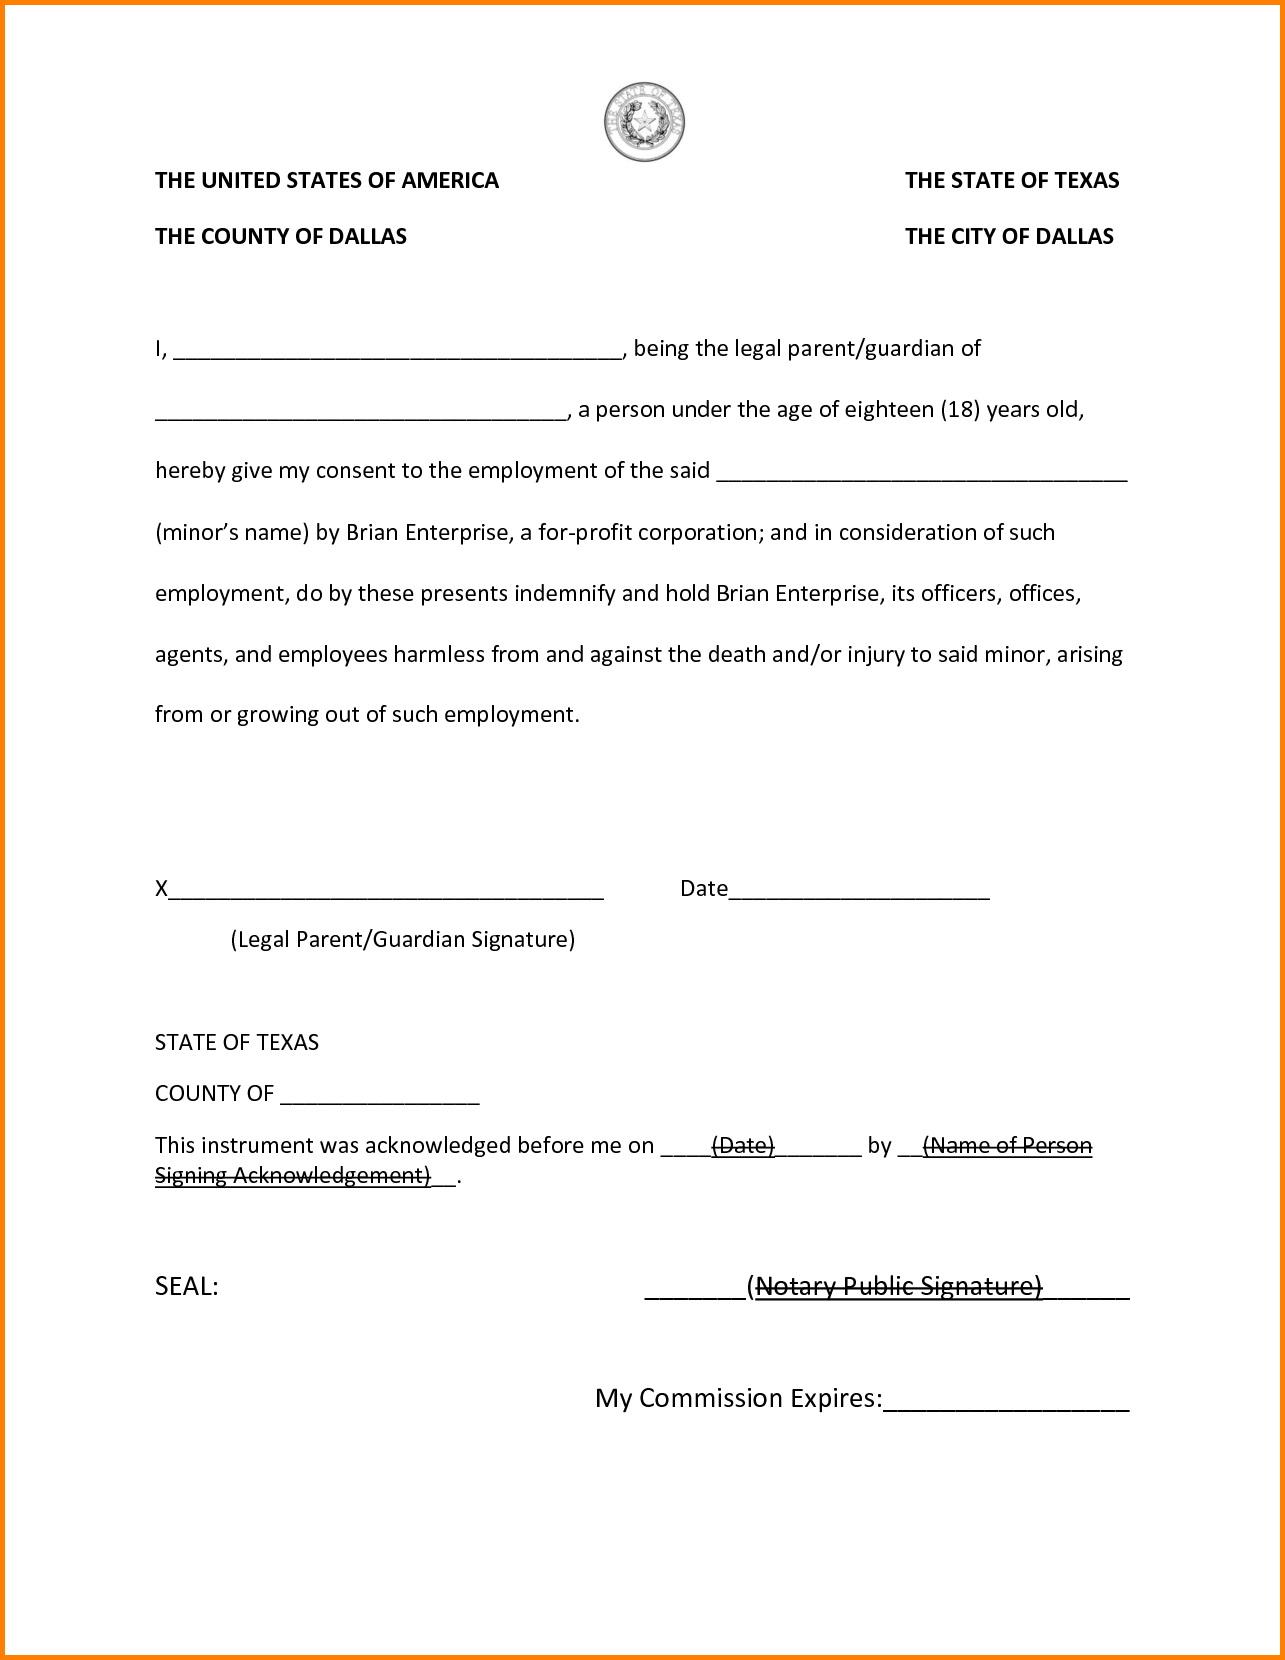 Notary Public Signature Line Template